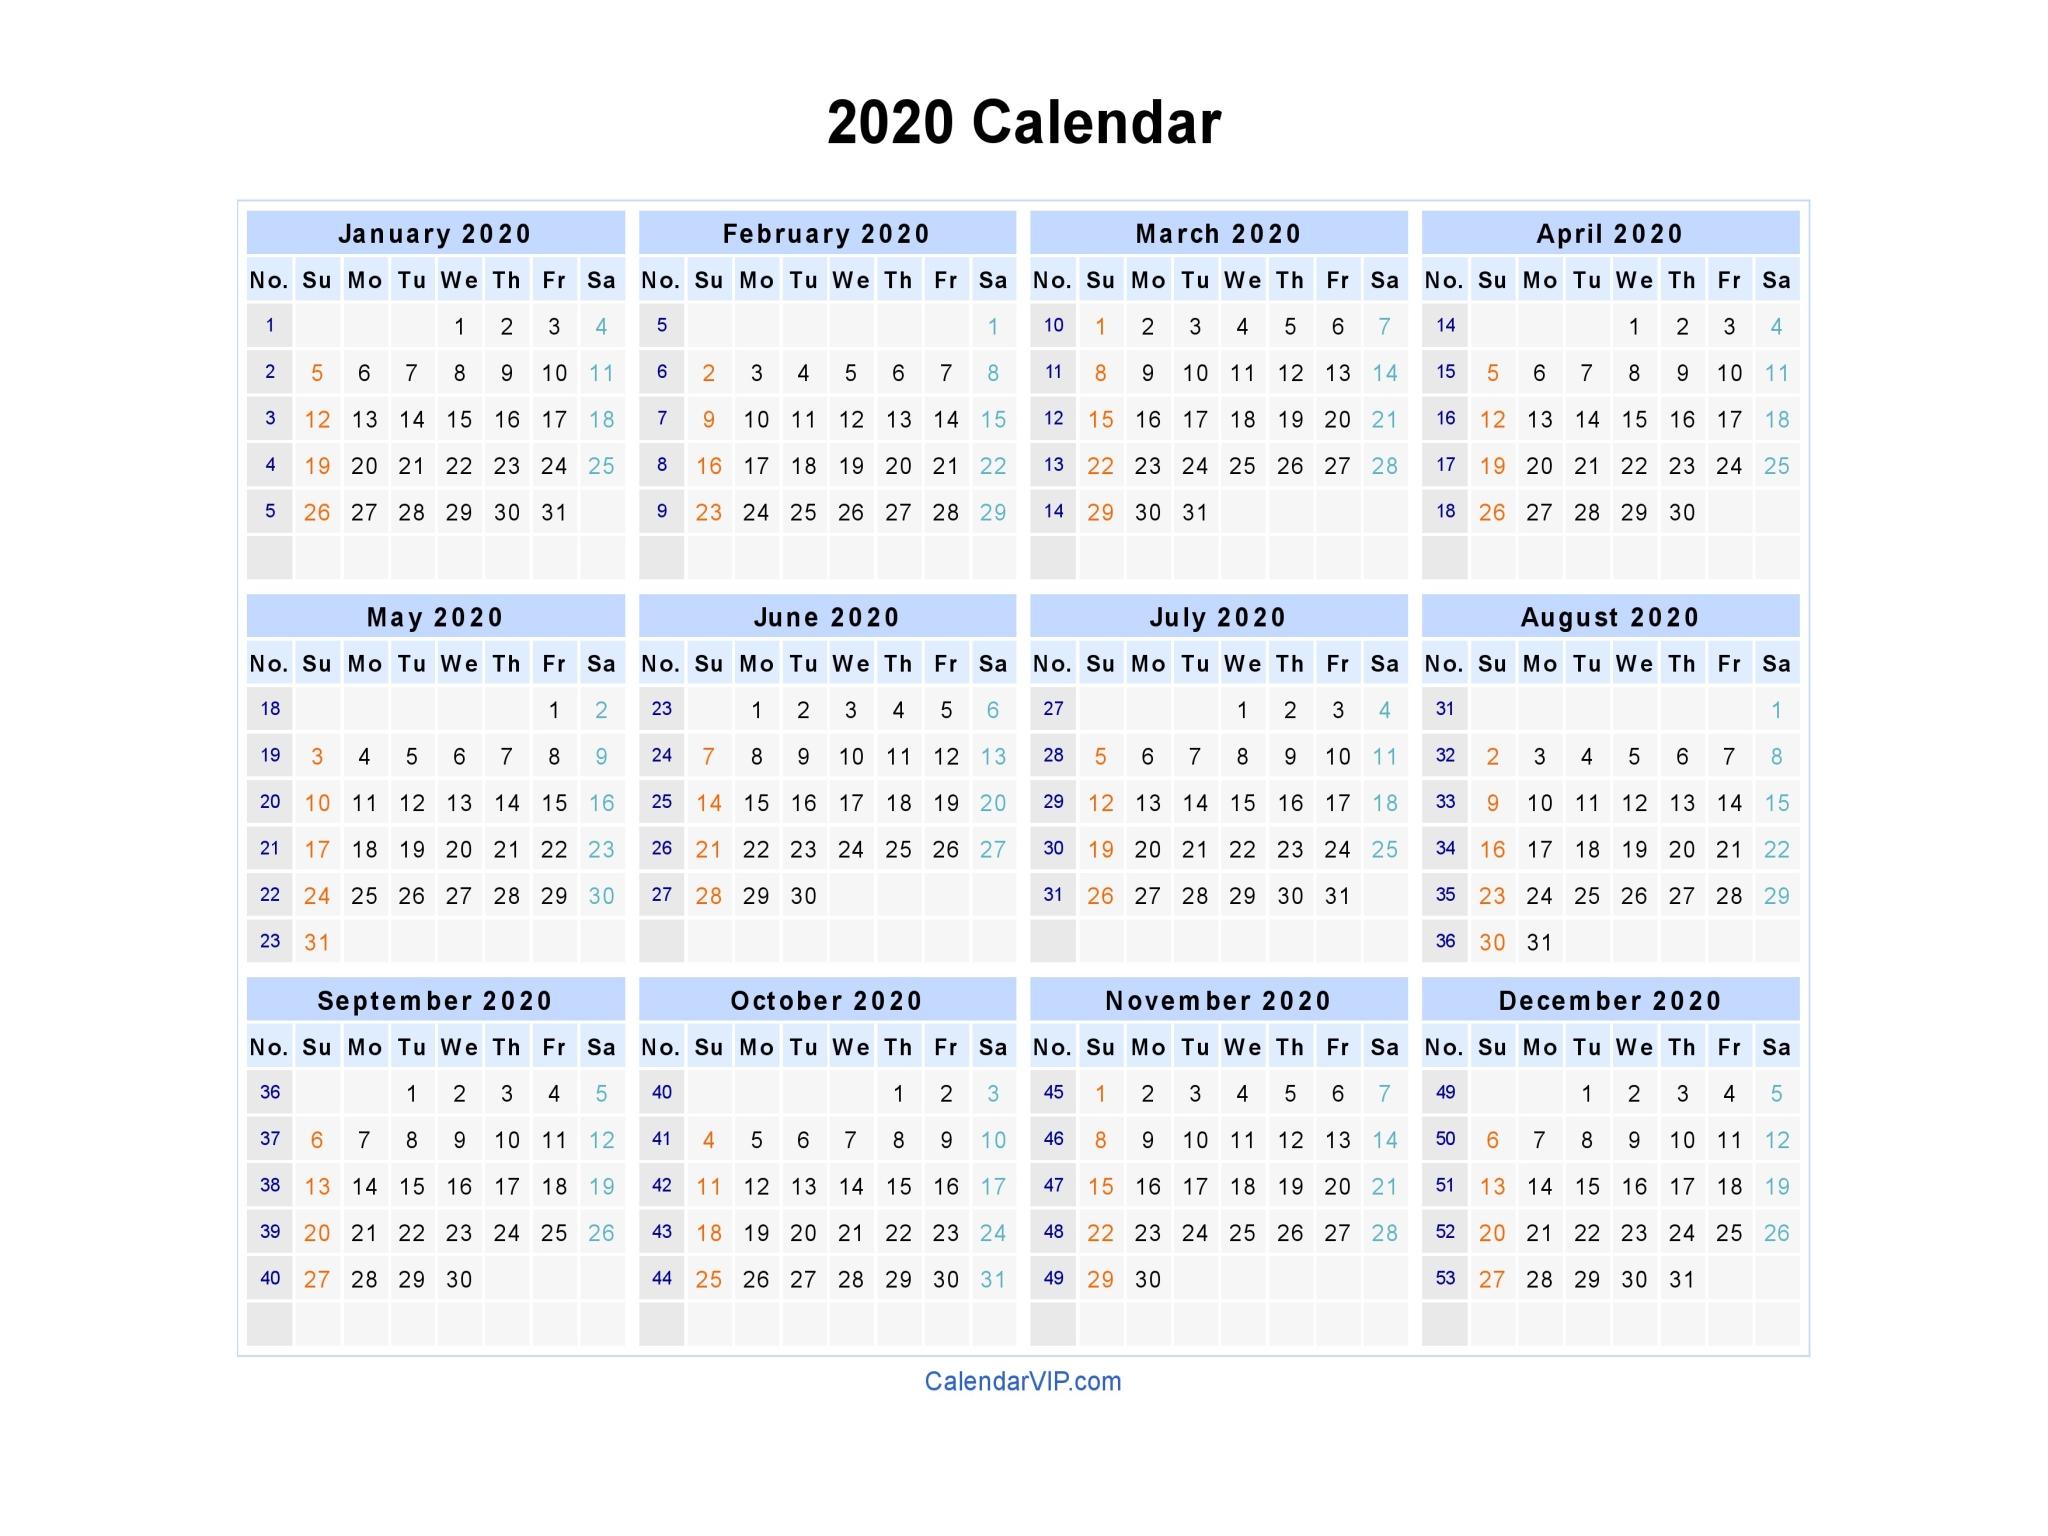 2020 Calendar - Blank Printable Calendar Template In Pdf Word Excel for Blank 2020 Calendars To Edit